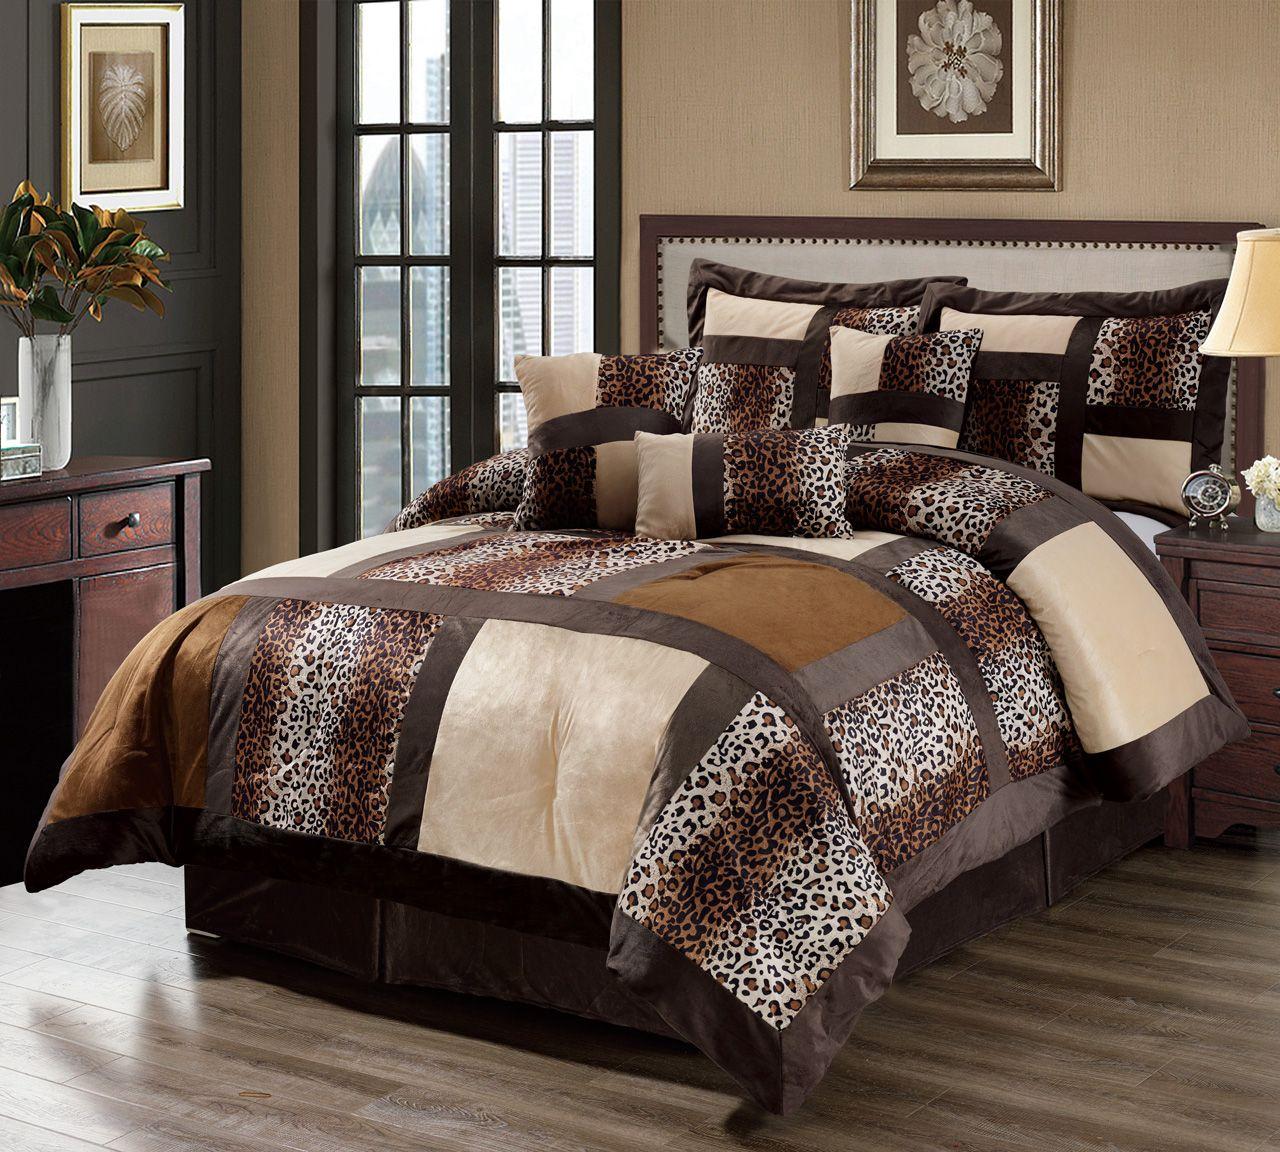 The Average Microfiber Comforter 11 Comforter sets